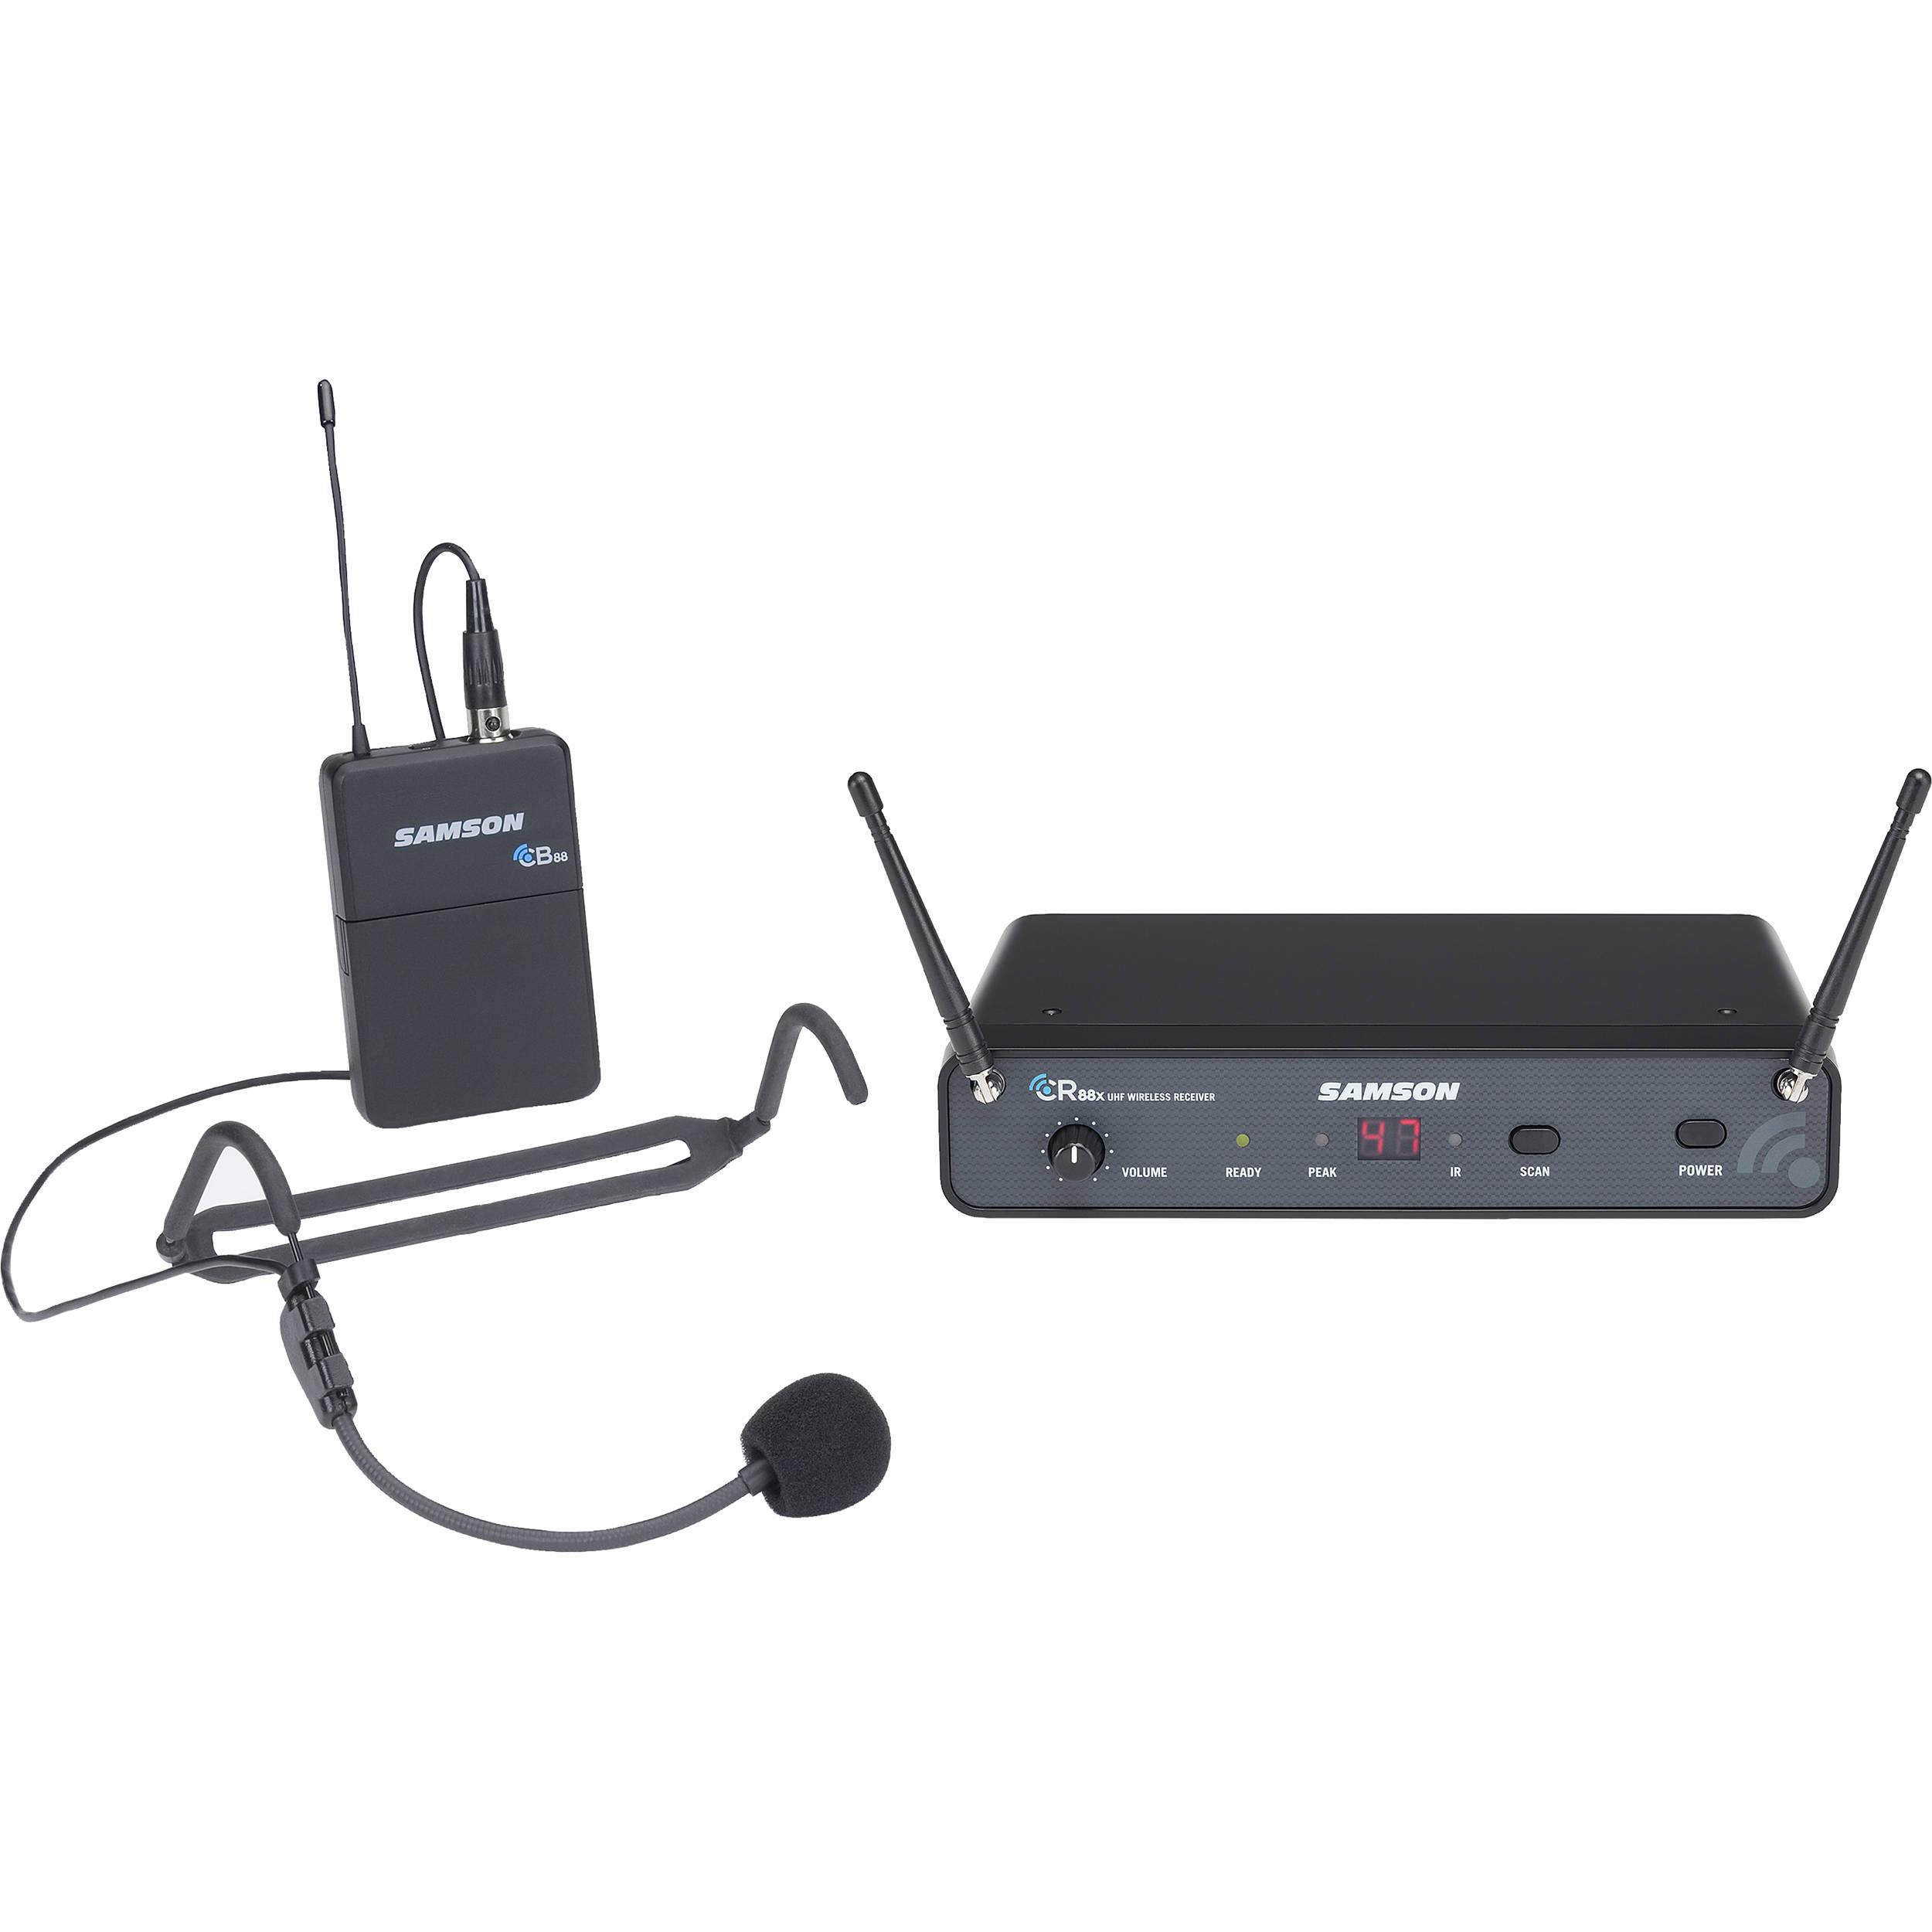 Samson Concert 88x Wireless Headset Microphone Swc88xbhs5 D B H